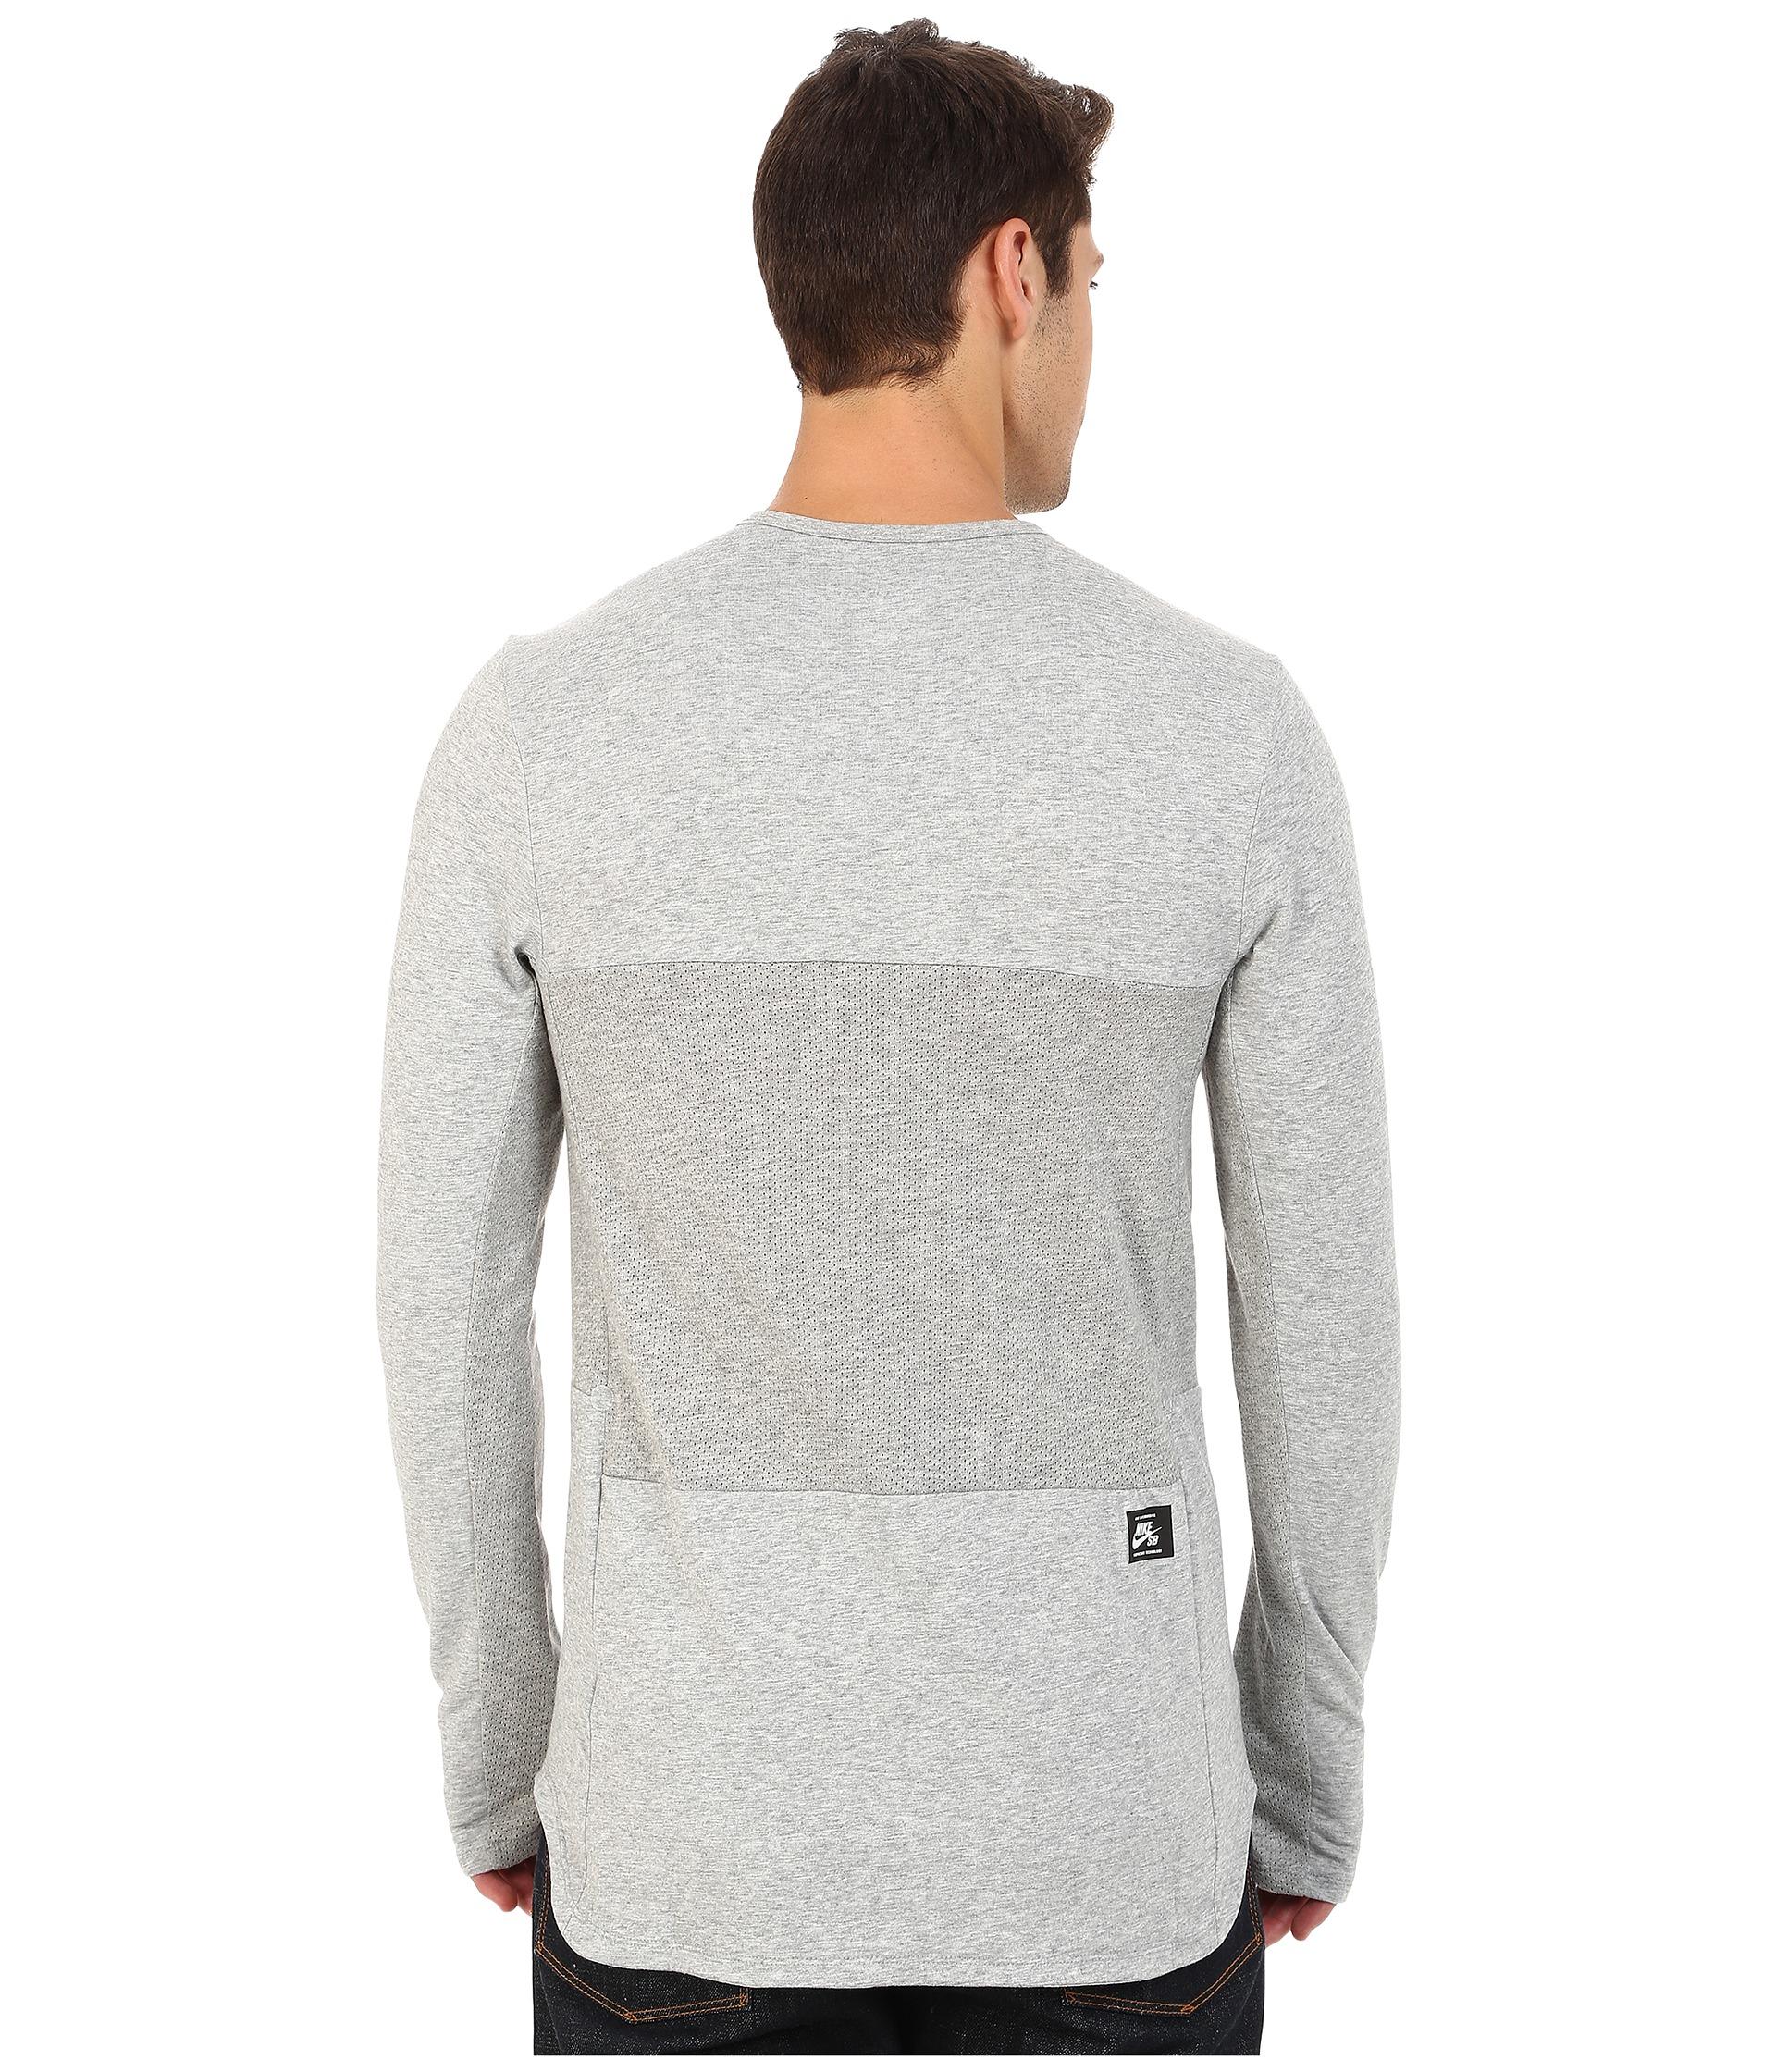 29166174 Nike Sb Skyline Dri-fit™ Cool Long Sleeve Crew in Gray for Men - Lyst